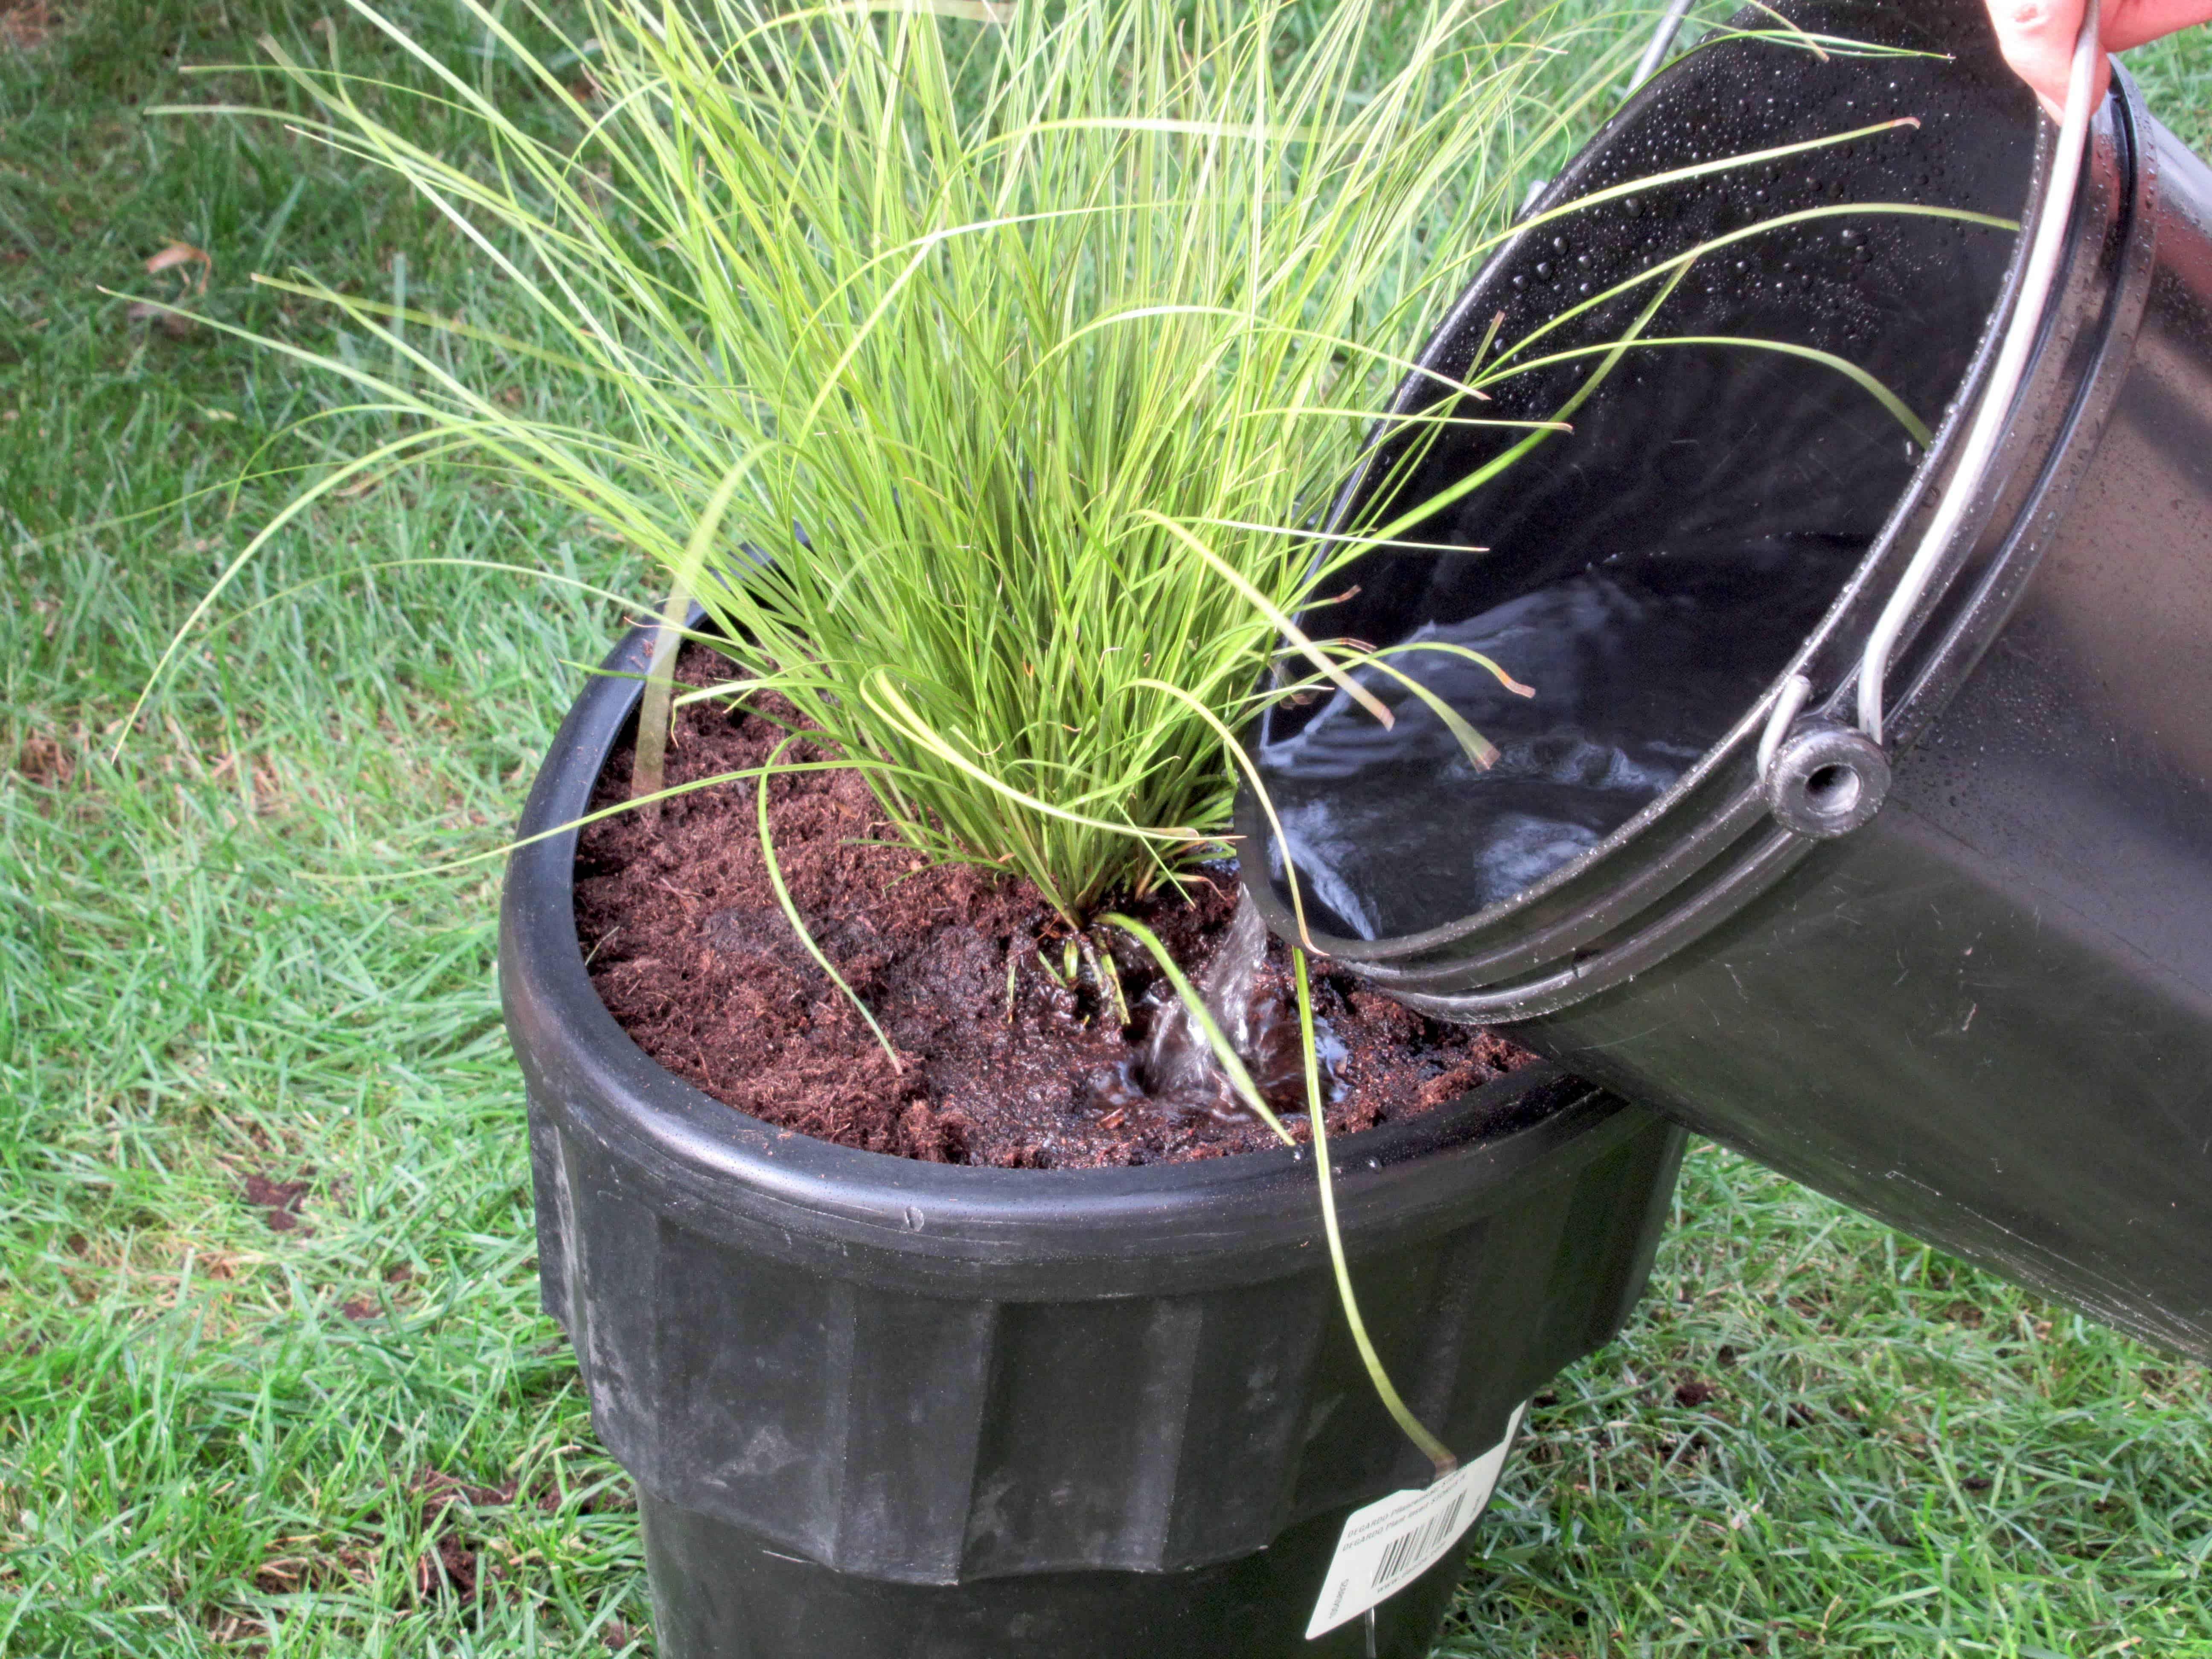 Plantje goed water geven